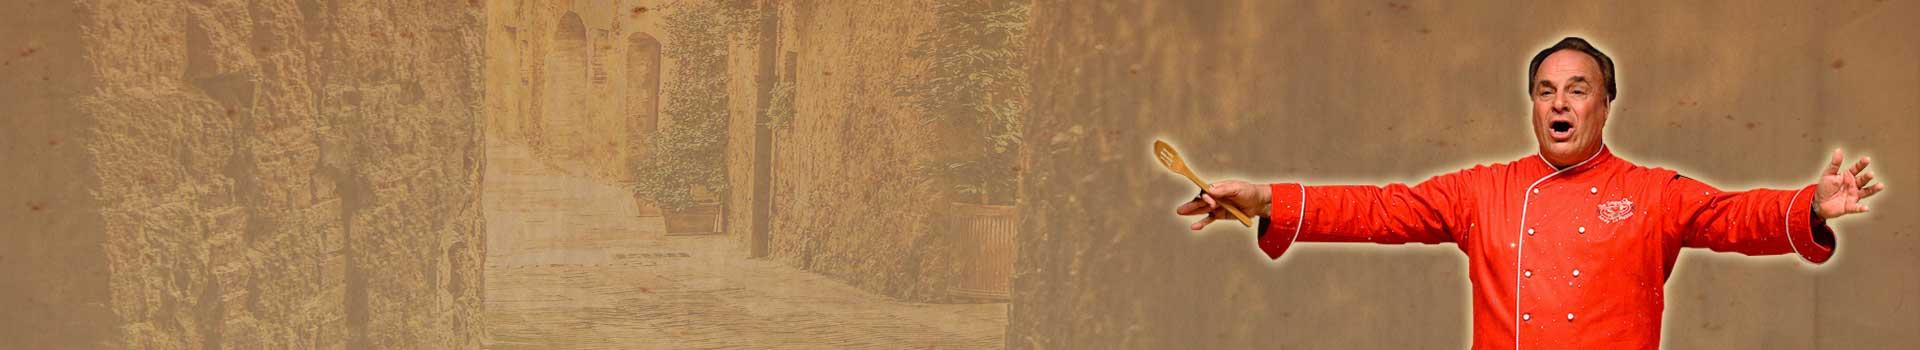 Venice City Walkway-Andy LoRusso